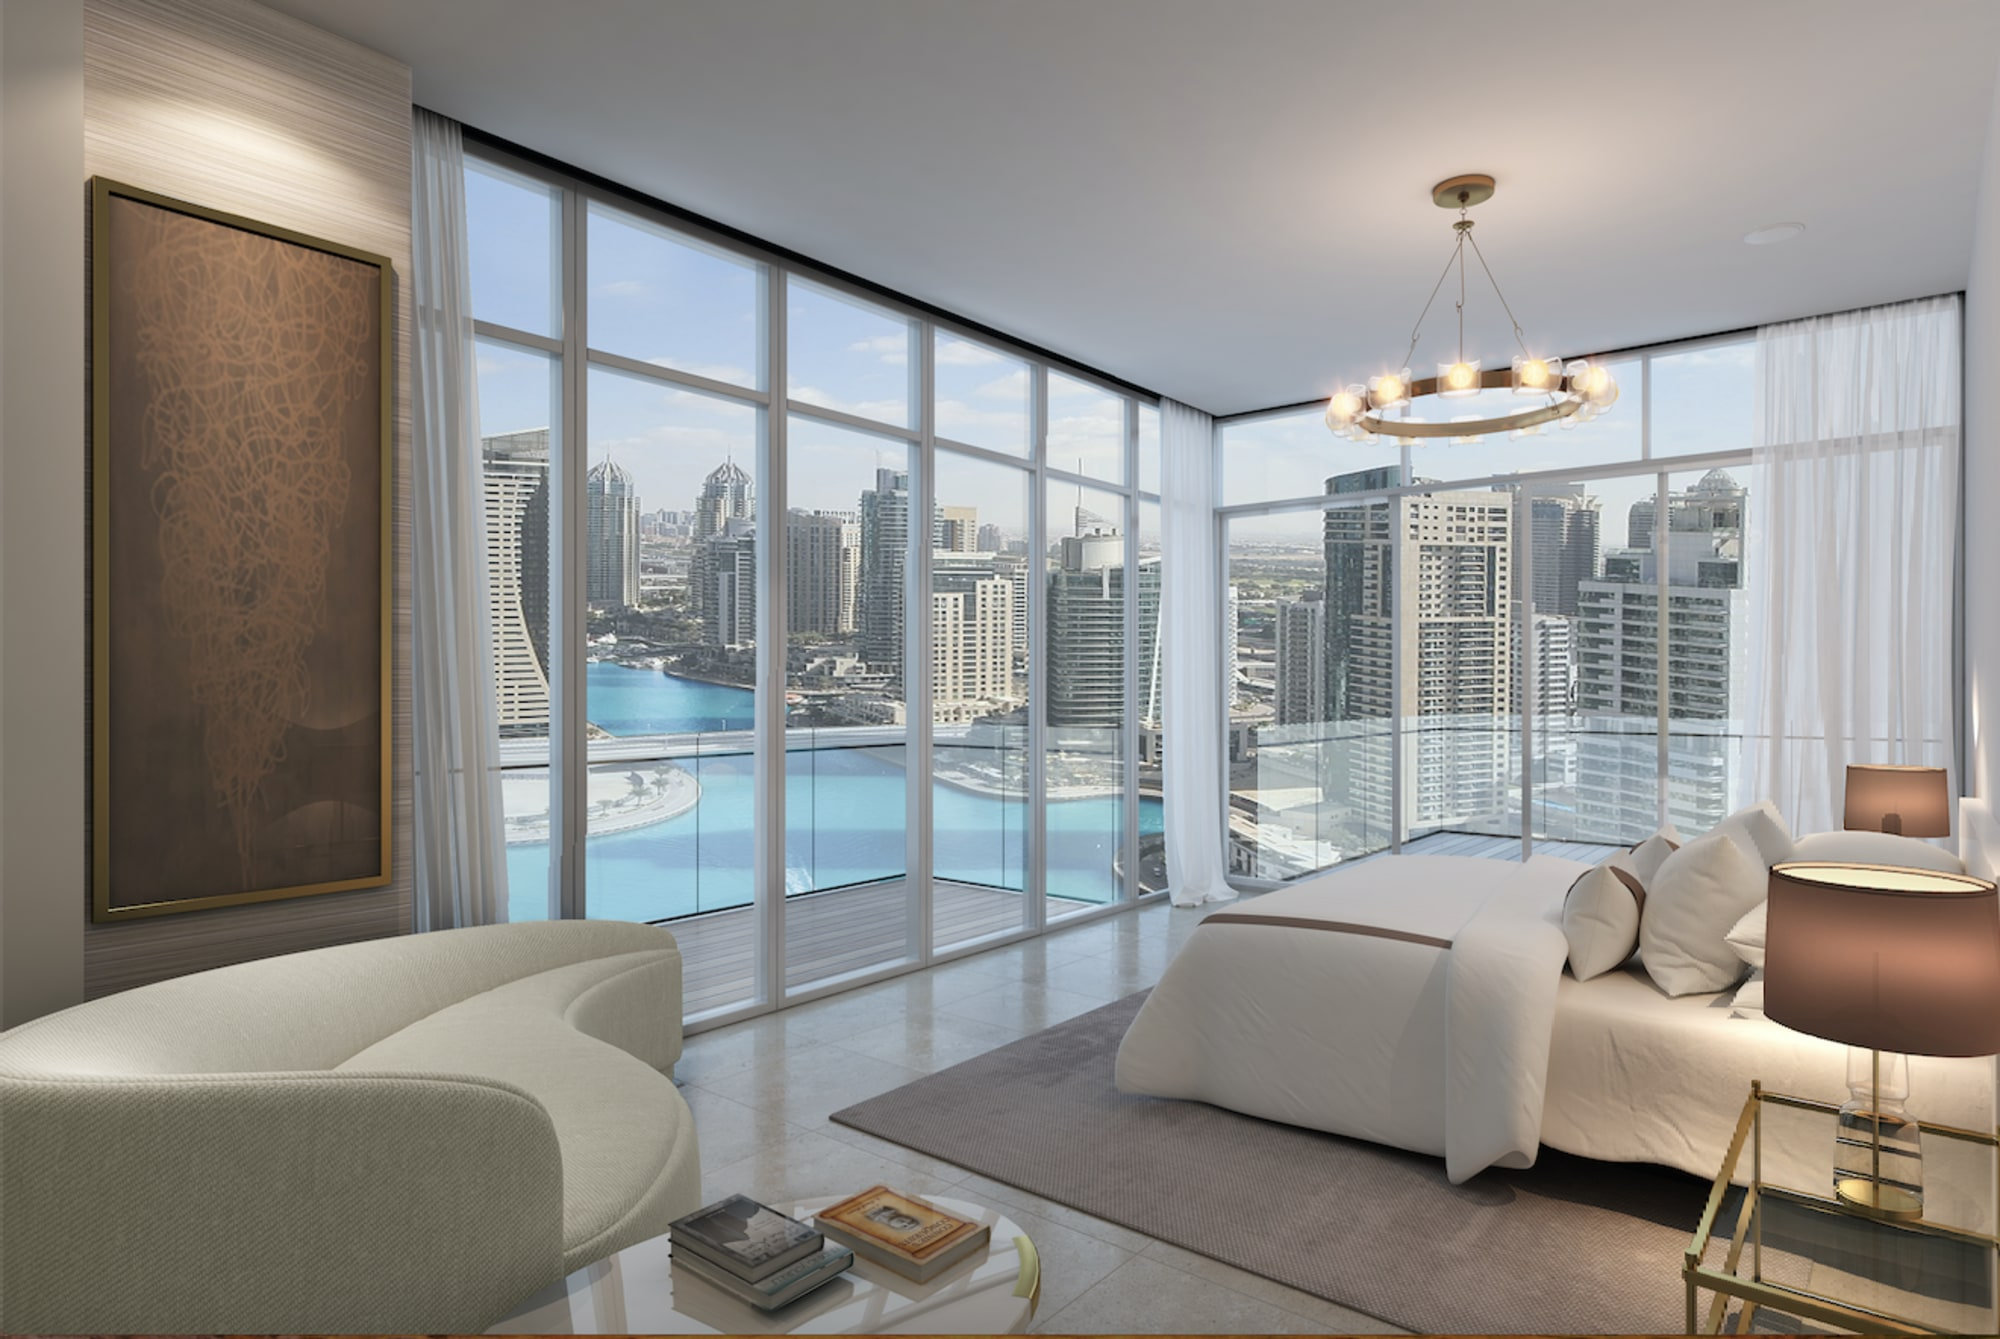 JBR Sea View | Modern 2 Bed Apt | Marina